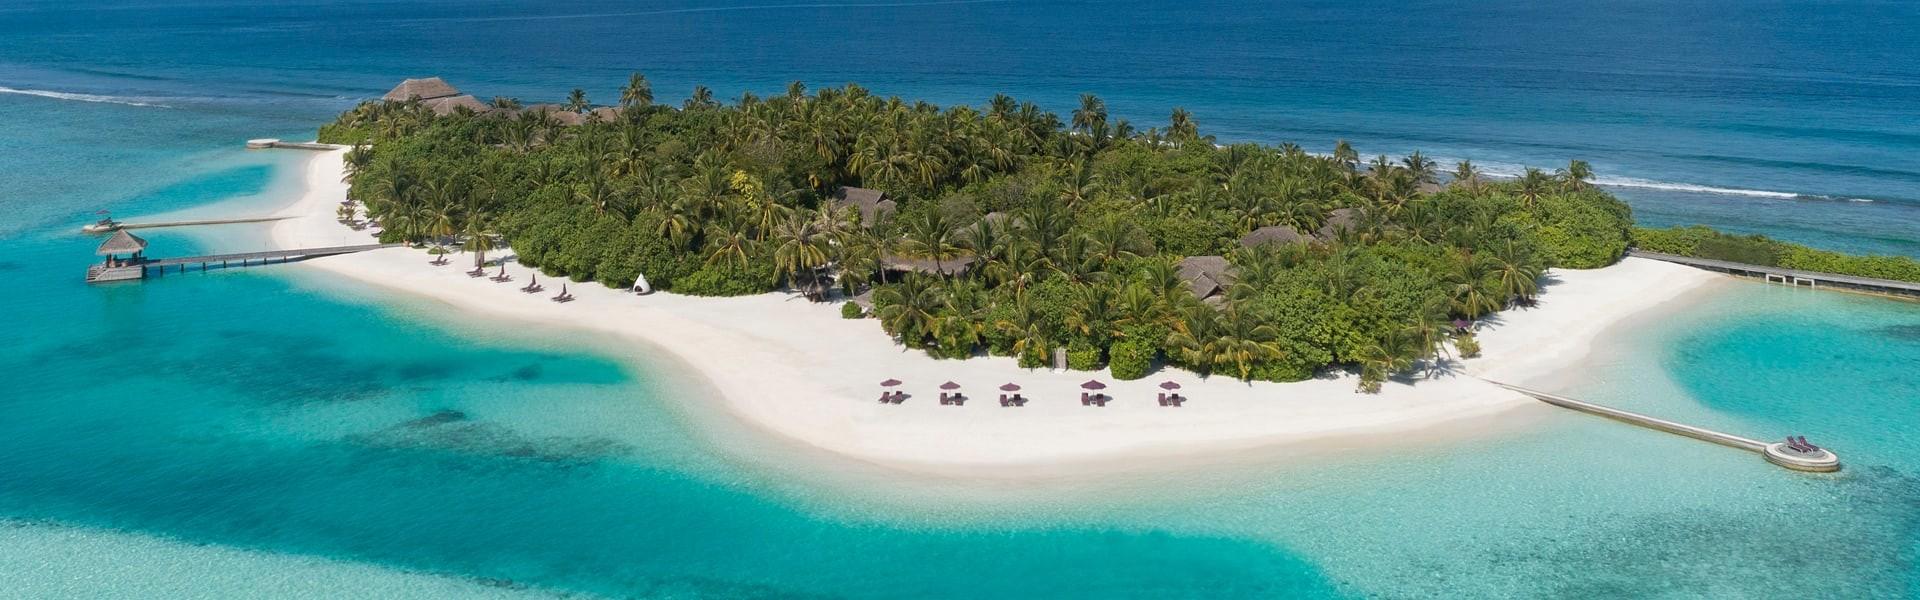 news-main-new-look-naladhu-private-island-maldives-to-relaunch-in-november.1625570113.jpg